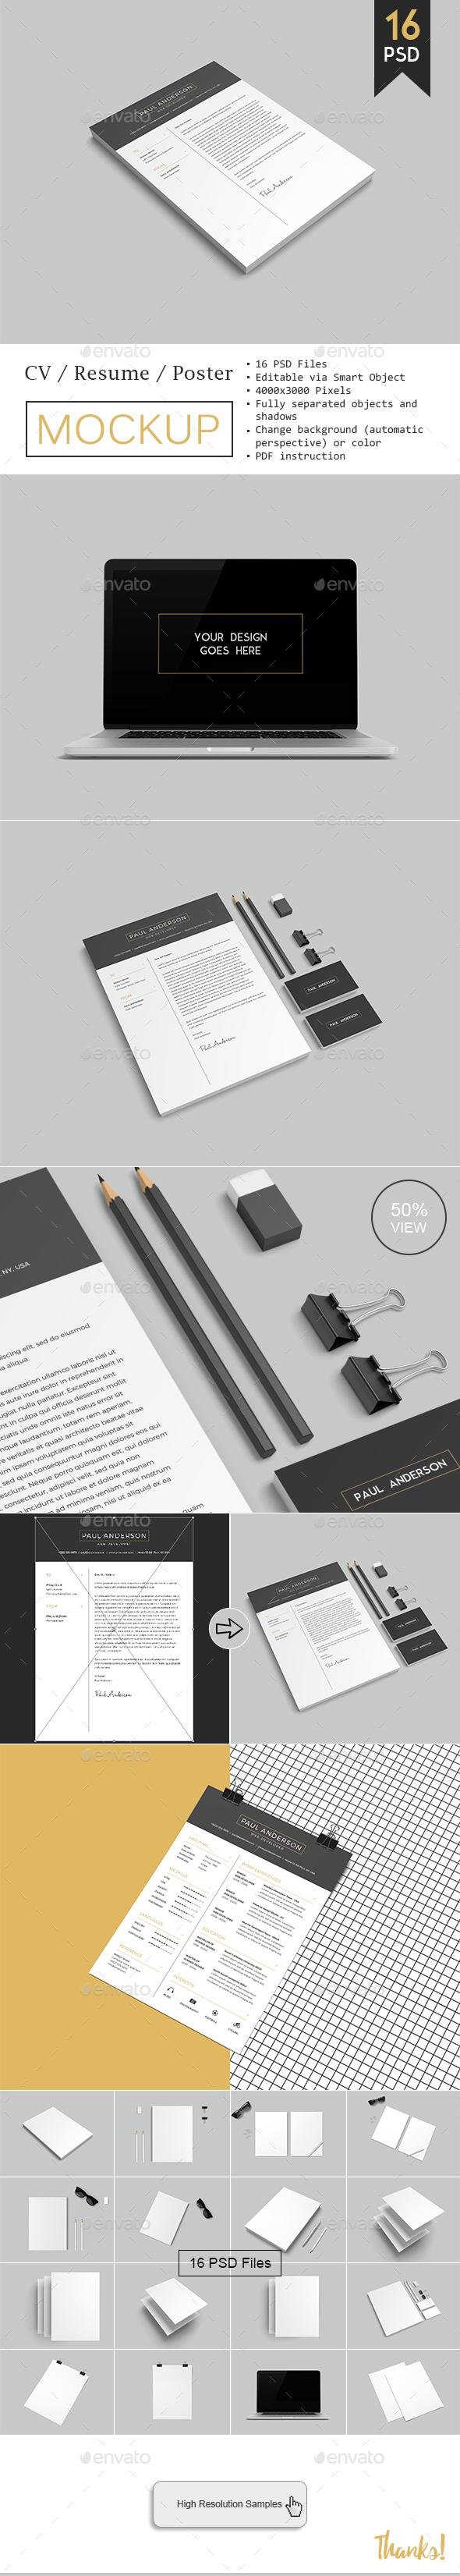 CV / Resume Mockup - Product Mock-Ups Graphics